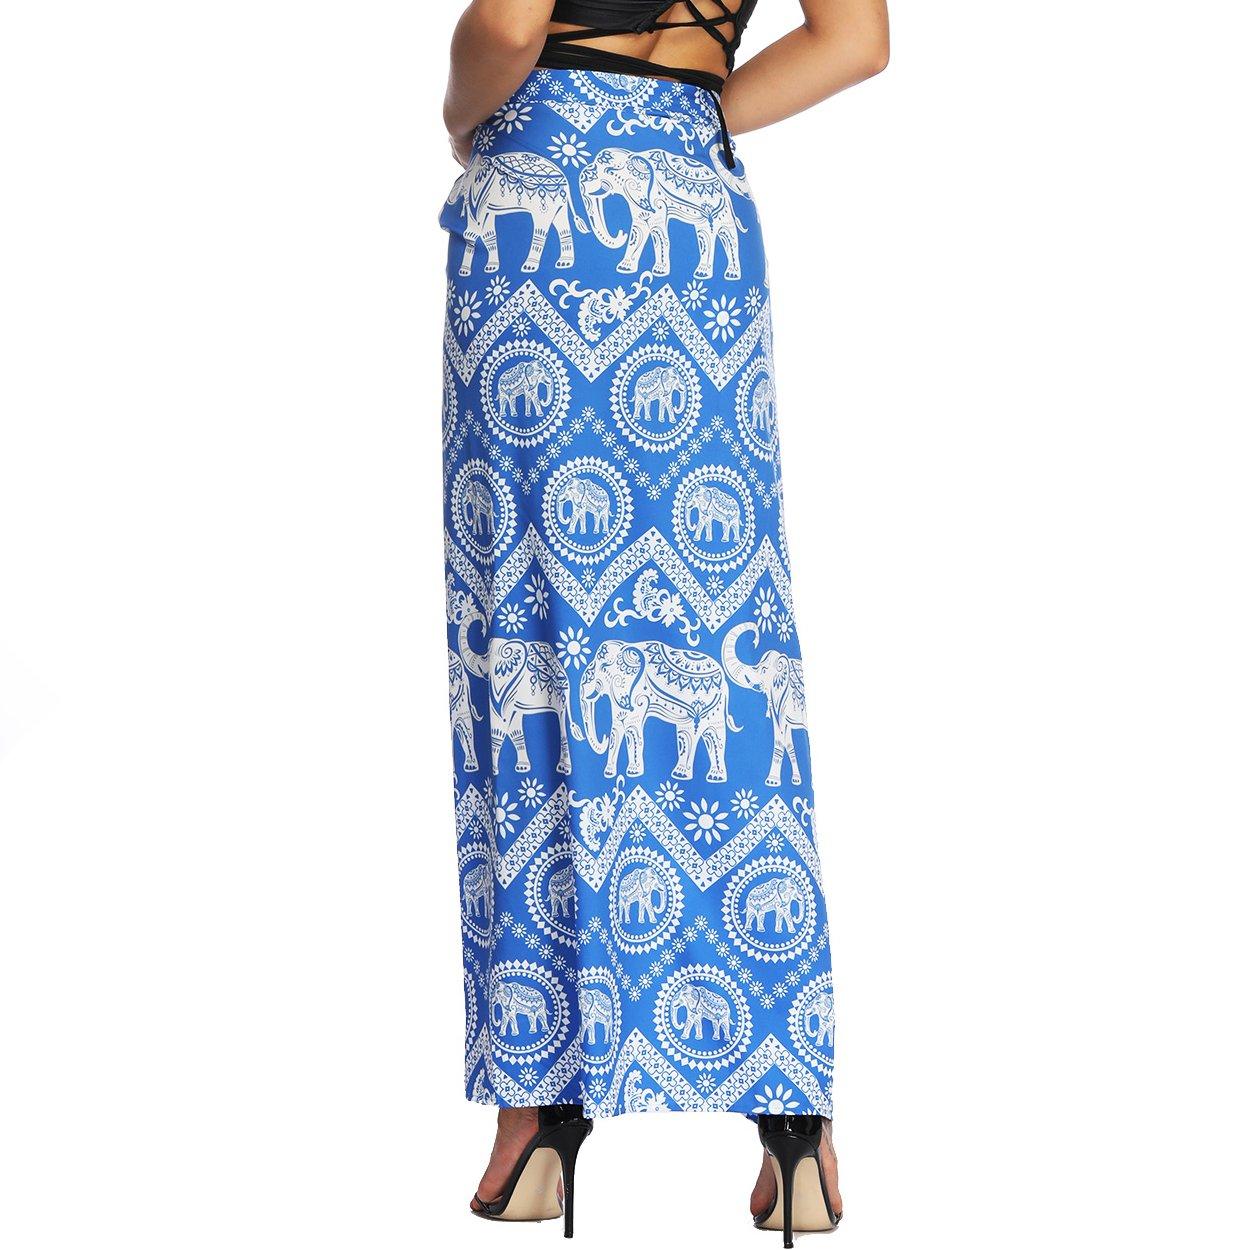 Nuofengkudu Mujer Falda Larga Hippie Gitana Amarra la Cintura Alta Boho Patrón De Estilo Tailandés Faldas de Playa Fiesta Casual Skirts Azul Elefante: ...